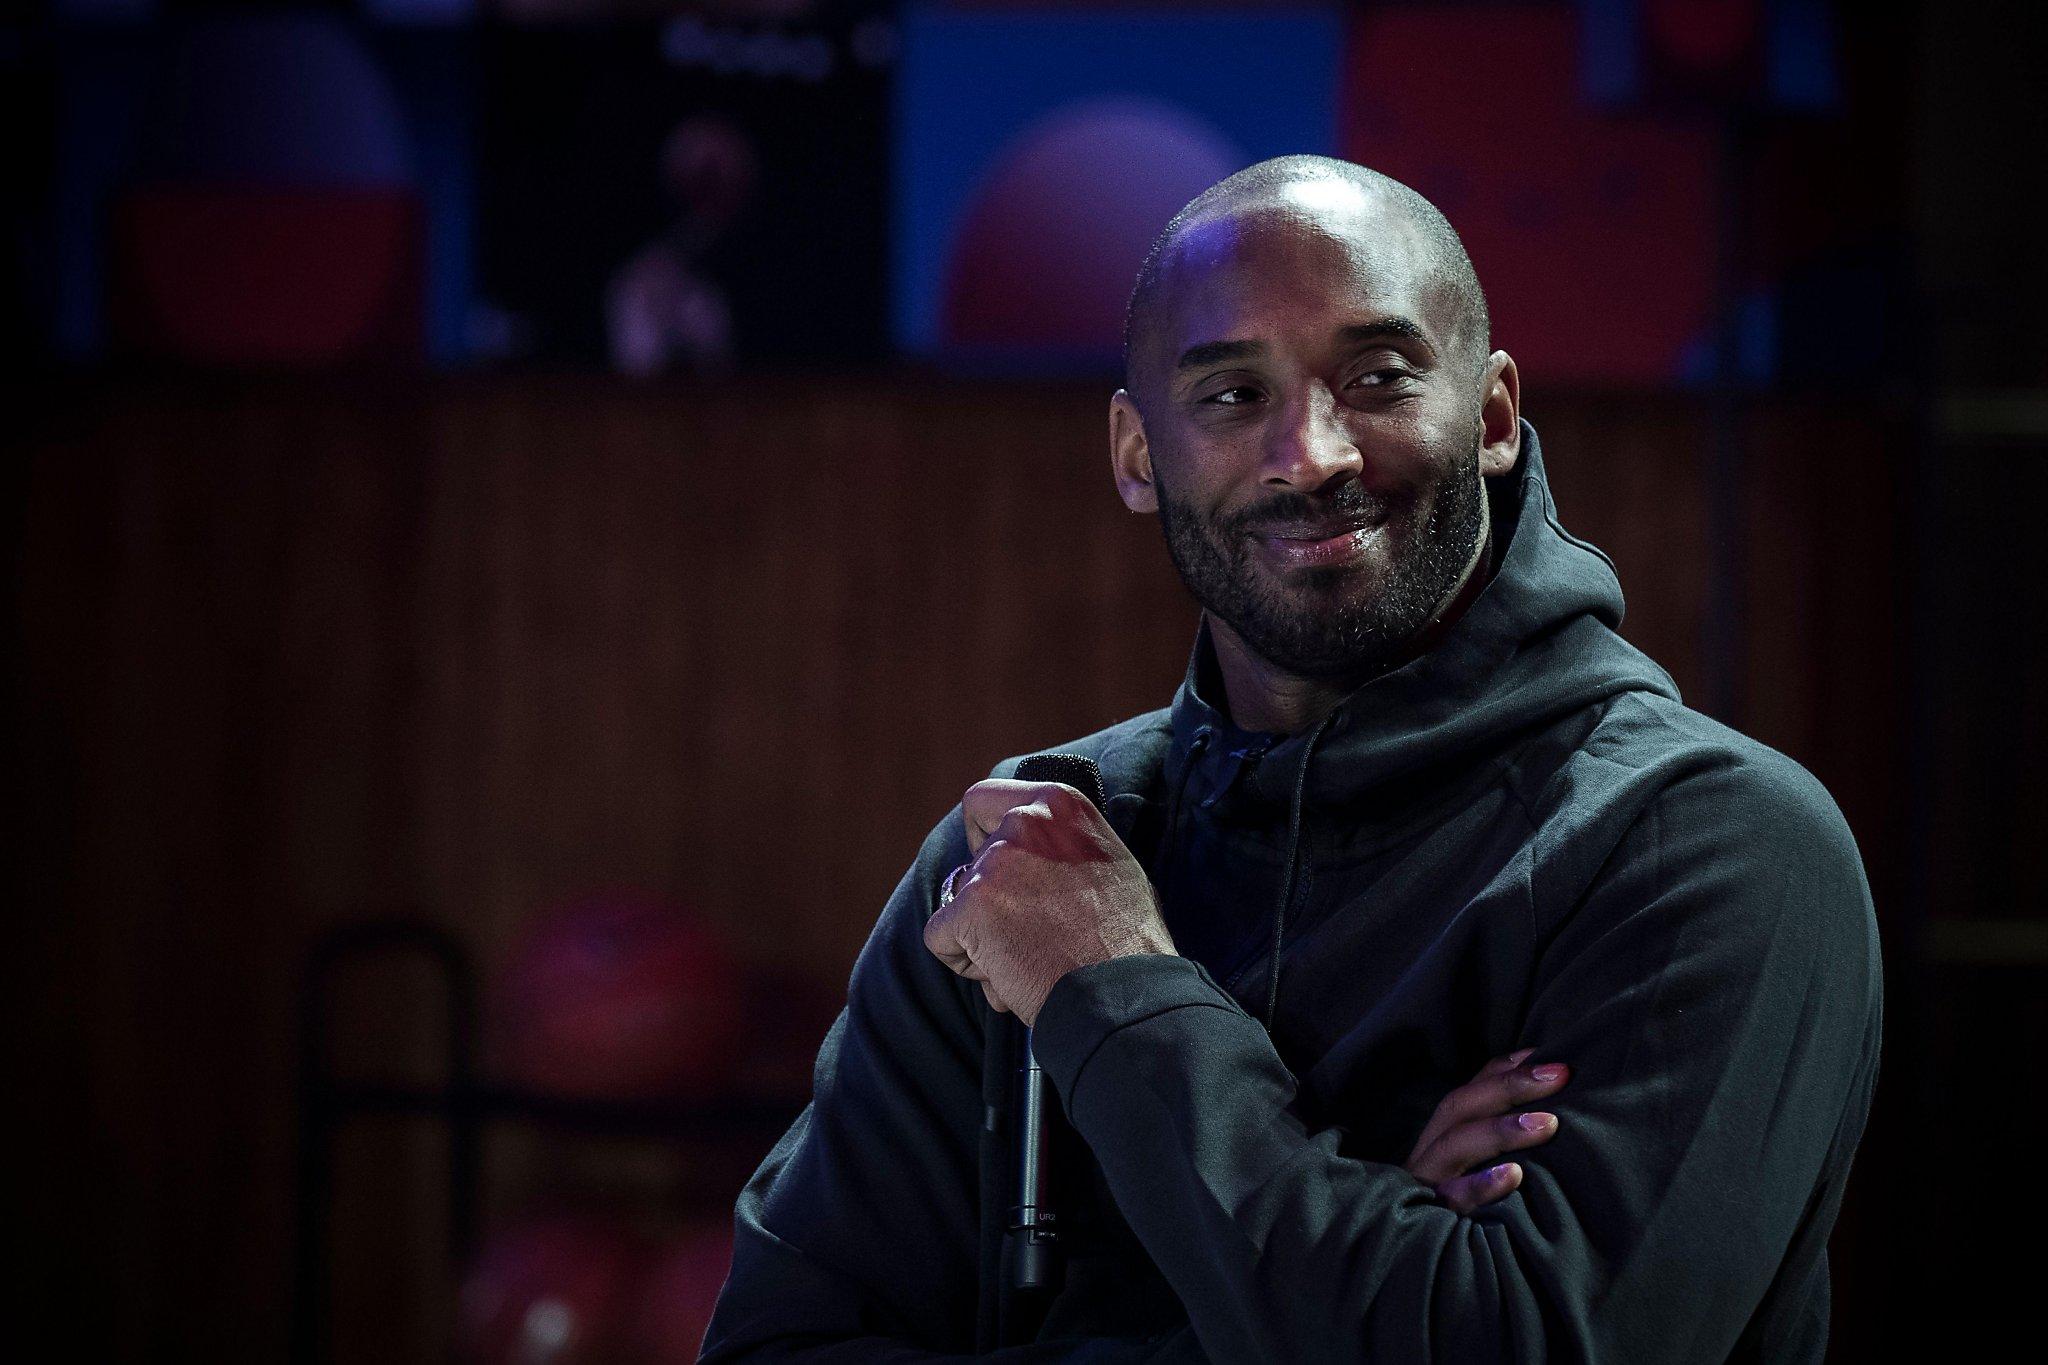 Kobe Bryant among eight finalists for Naismith Memorial Basketball Hall of Fame